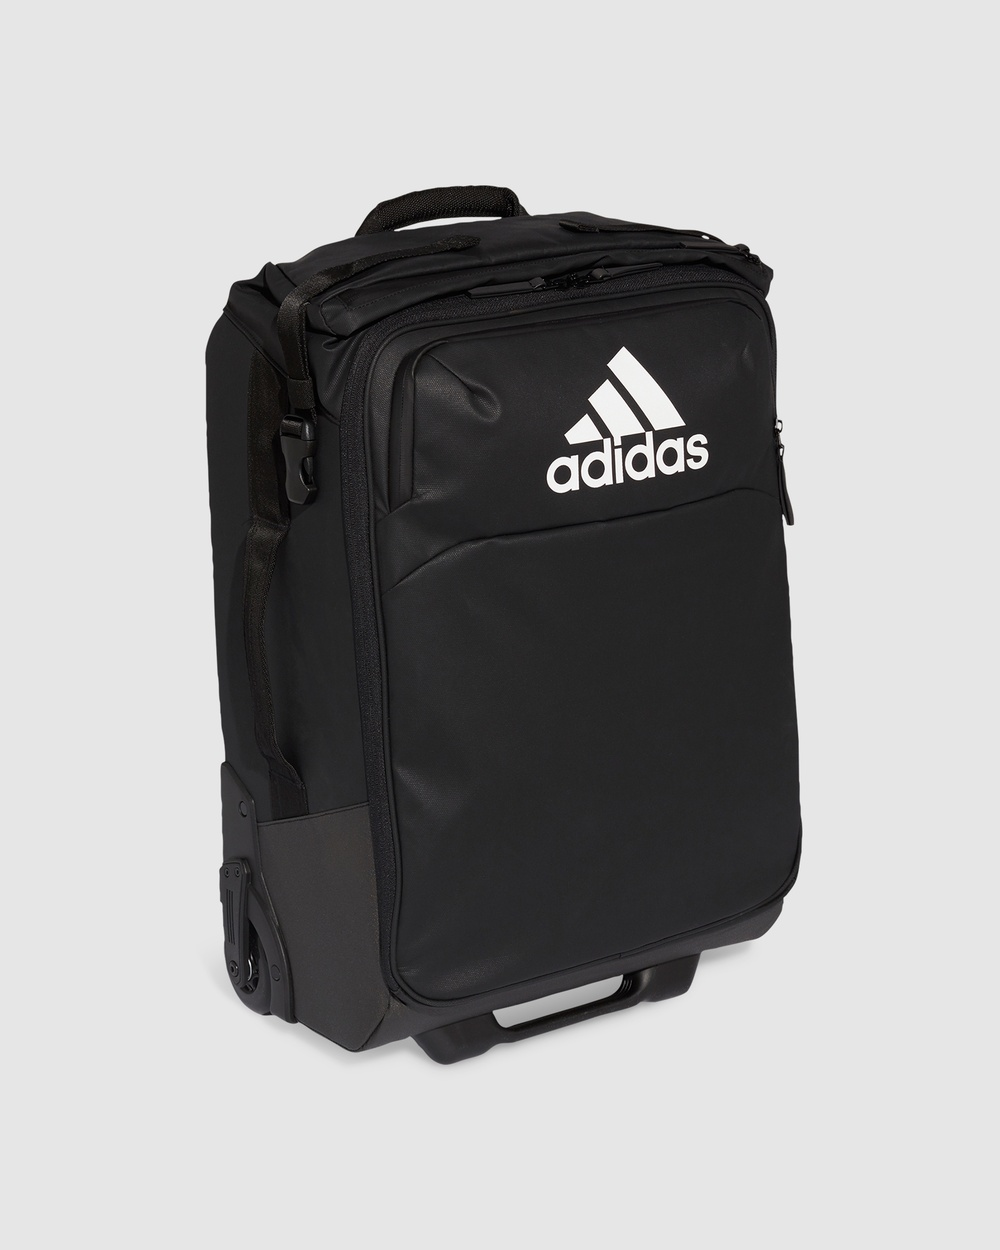 adidas Performance Trolley Bag Small Travel and Luggage Black